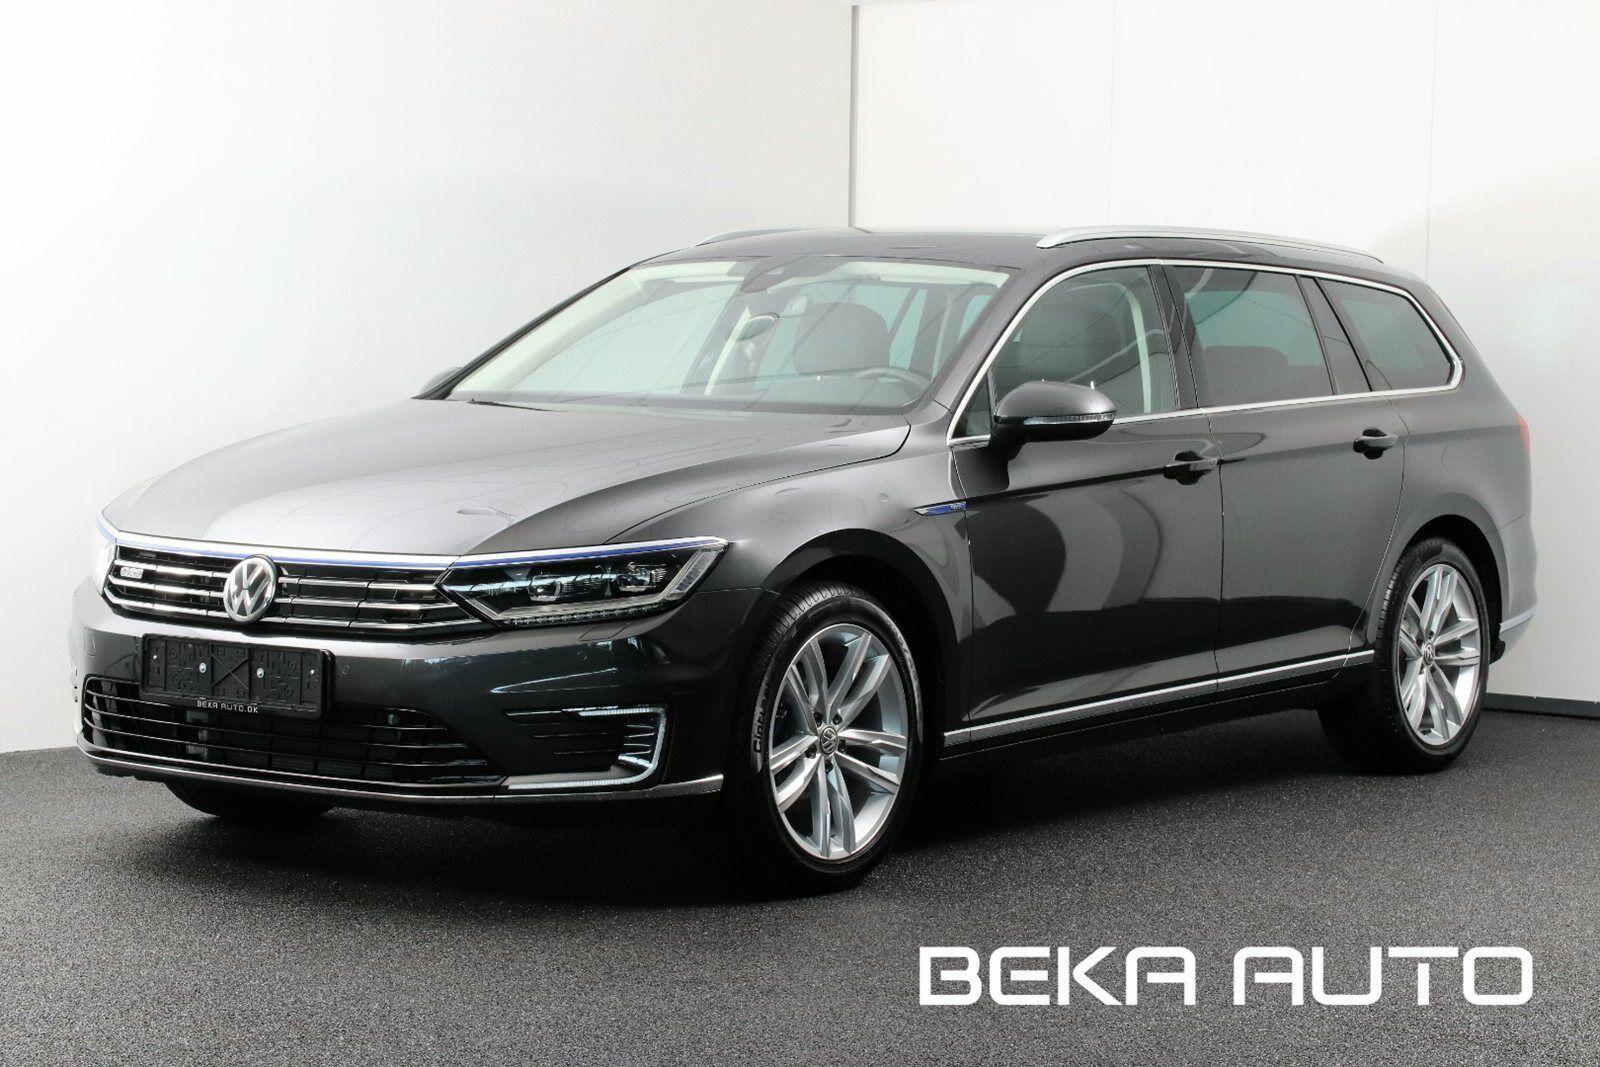 VW Passat 1,4 GTE Variant DSG 5d - 459.800 kr.